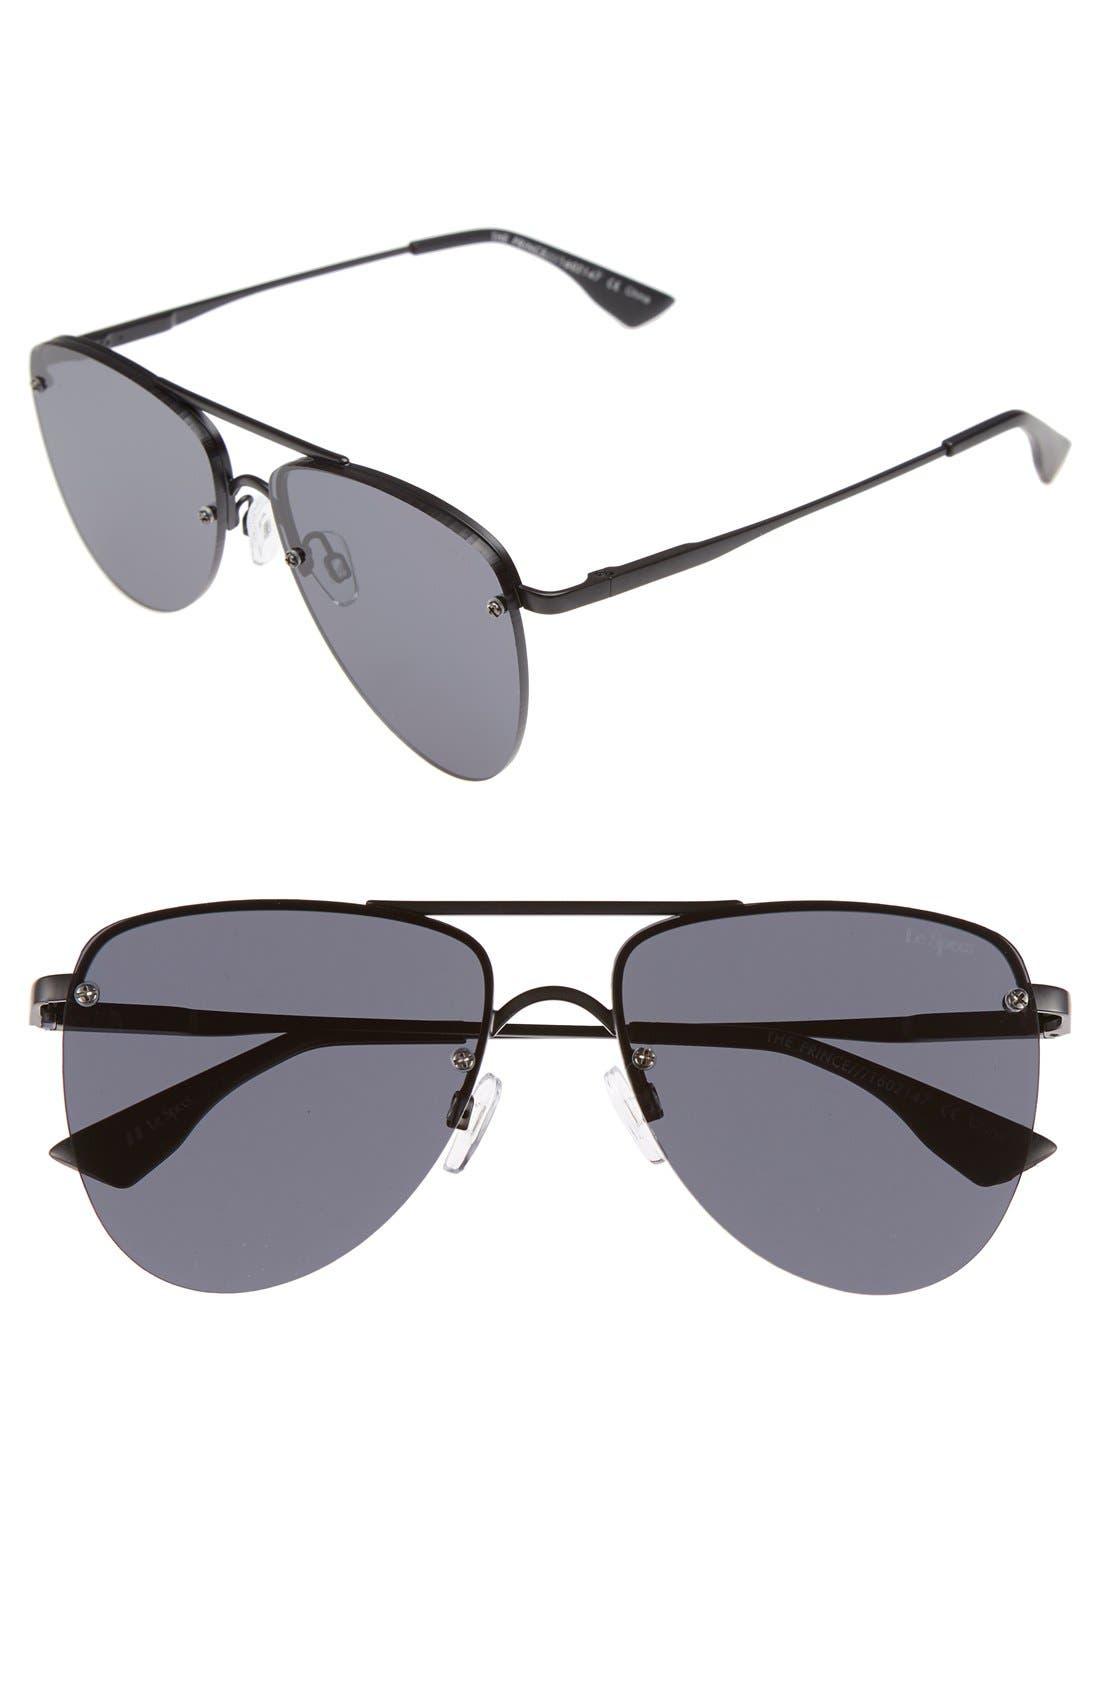 Main Image - Le Specs The Prince 57mm Aviator Sunglasses